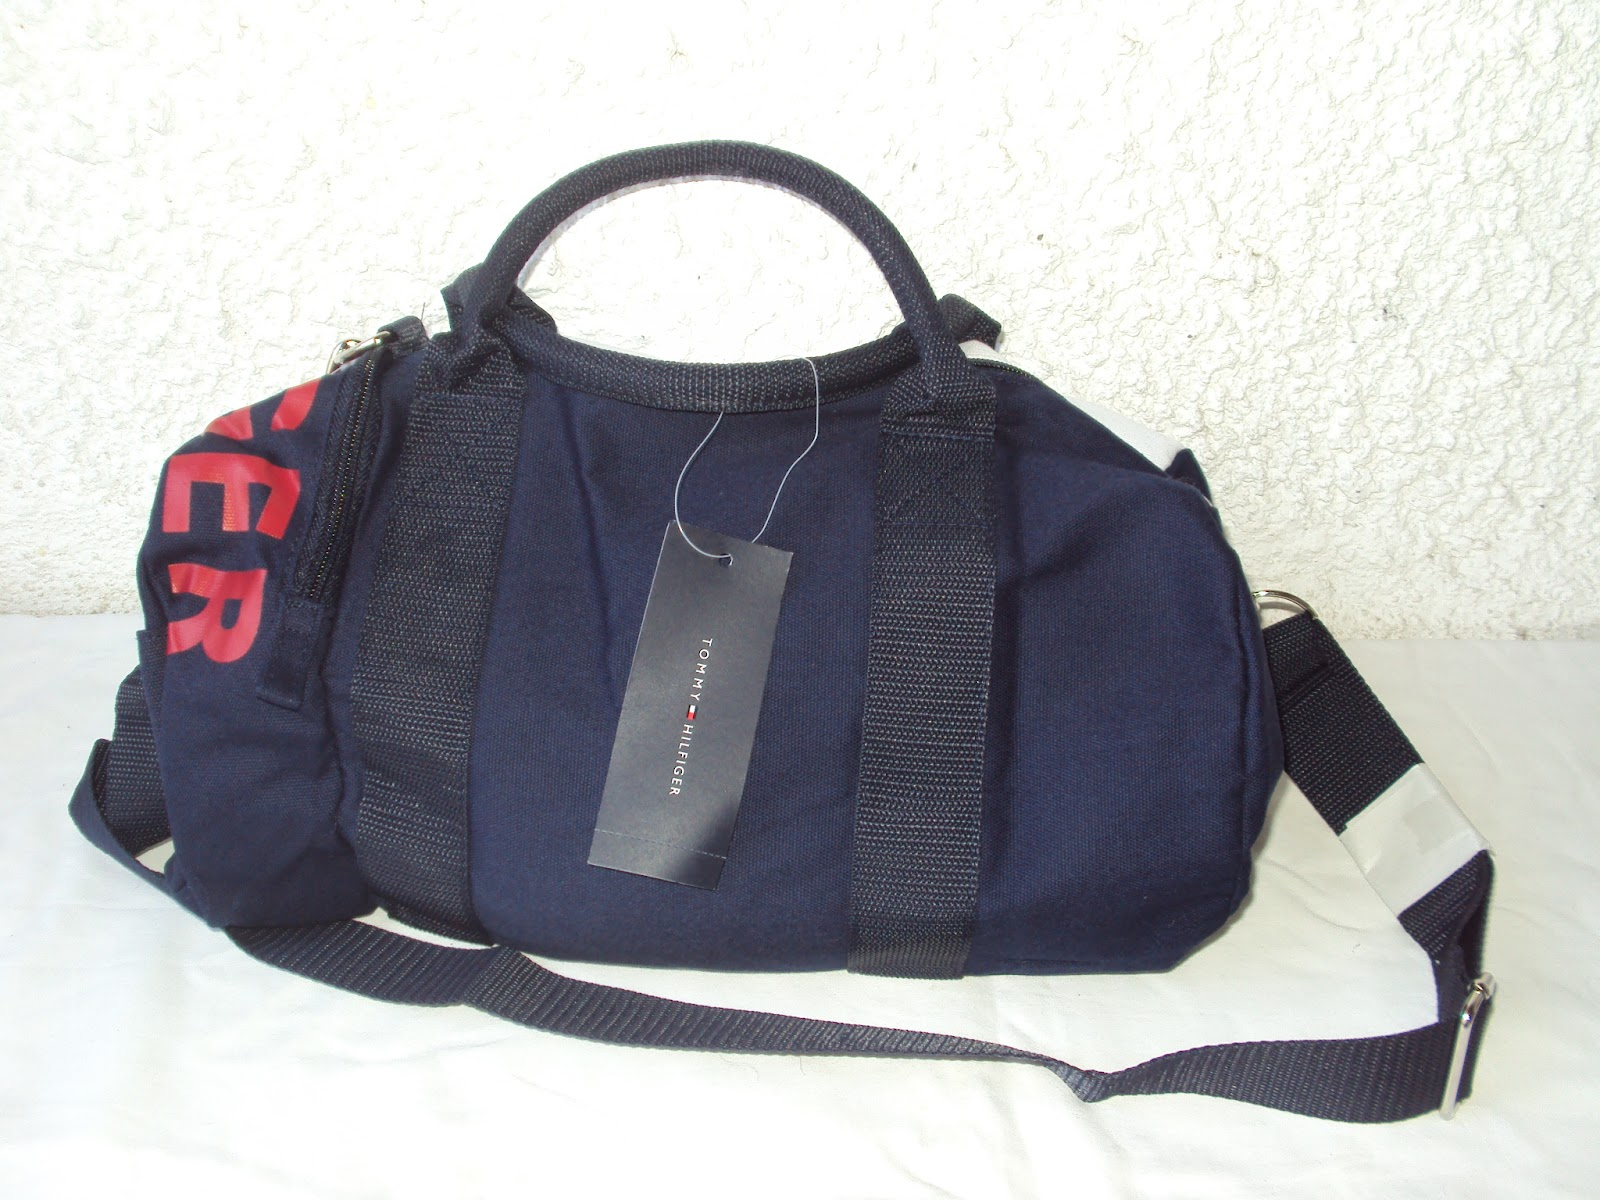 Bolsa Tommy Hilfiger Duffle Bag - Pronta Entrega  9ba582c9abc